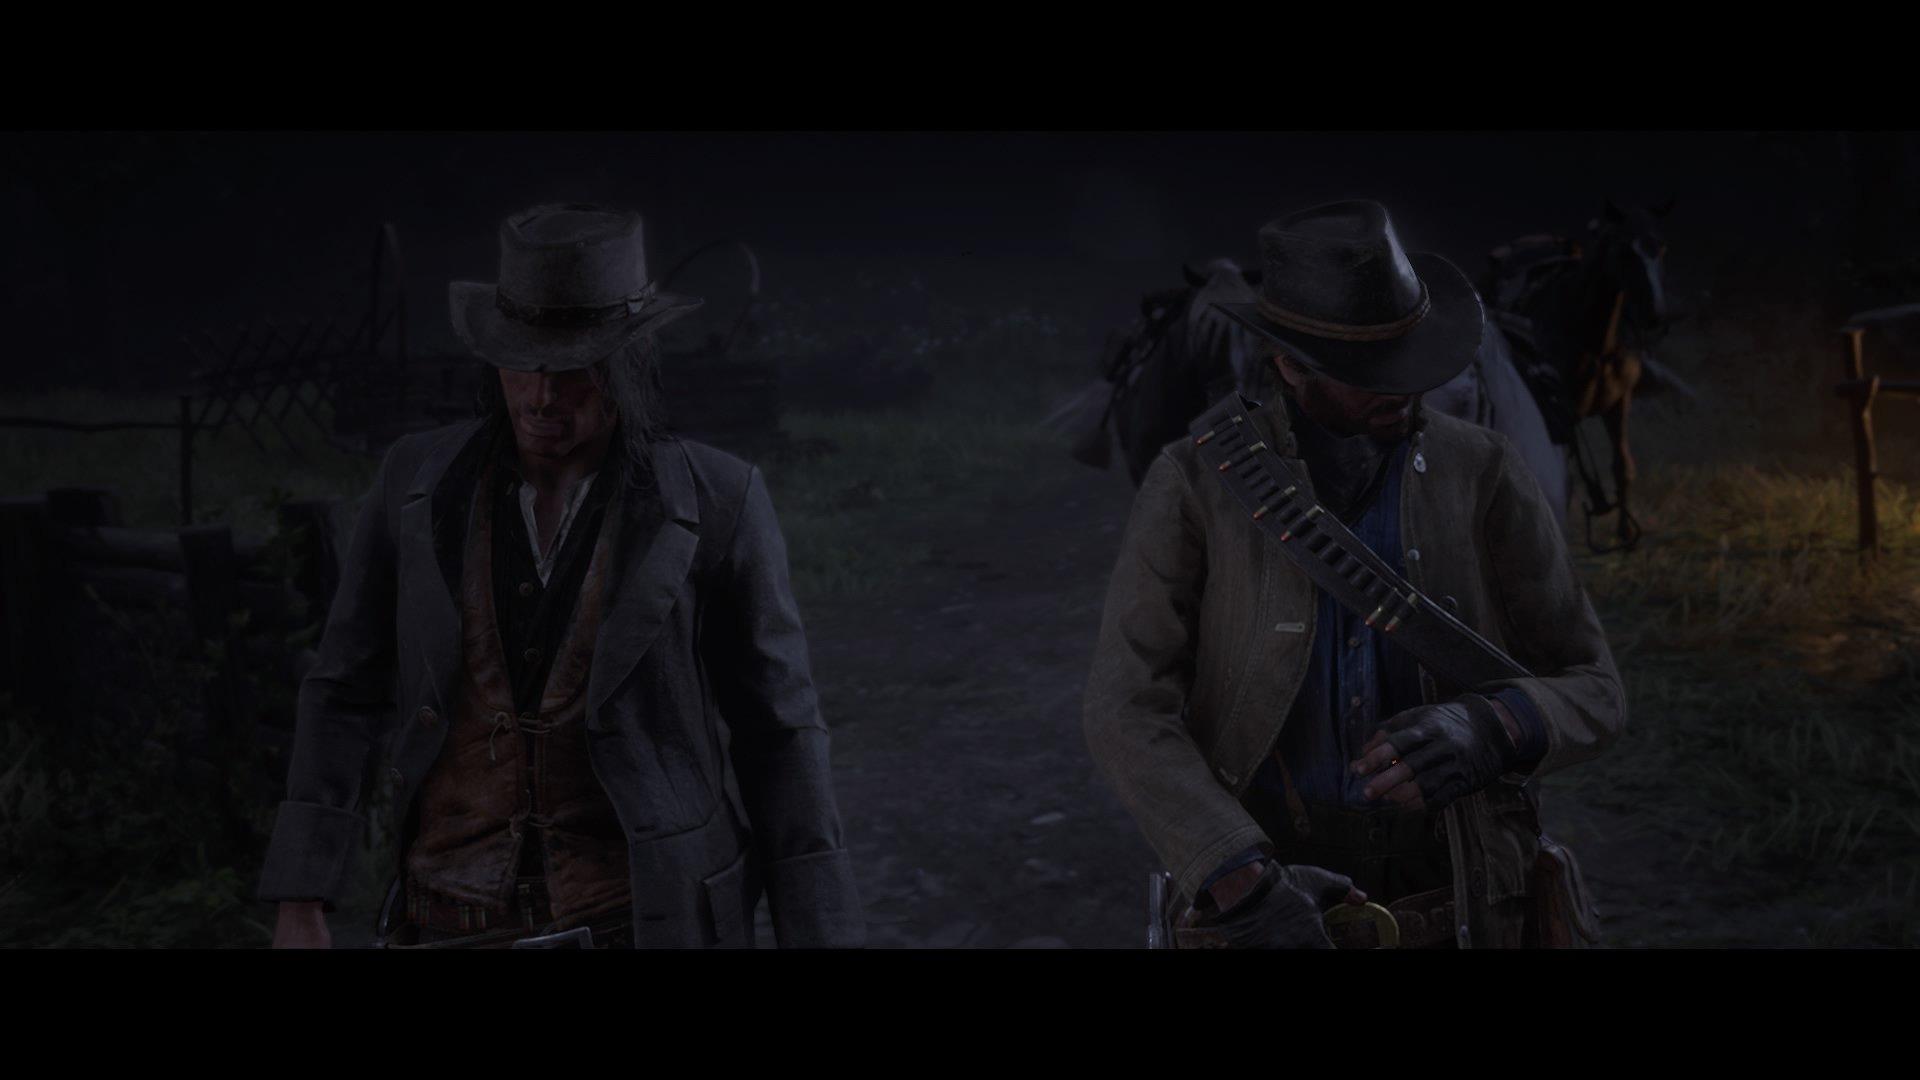 1543431939_DtG9VtqWsAAjiXw.jpg - Red Dead Redemption 2